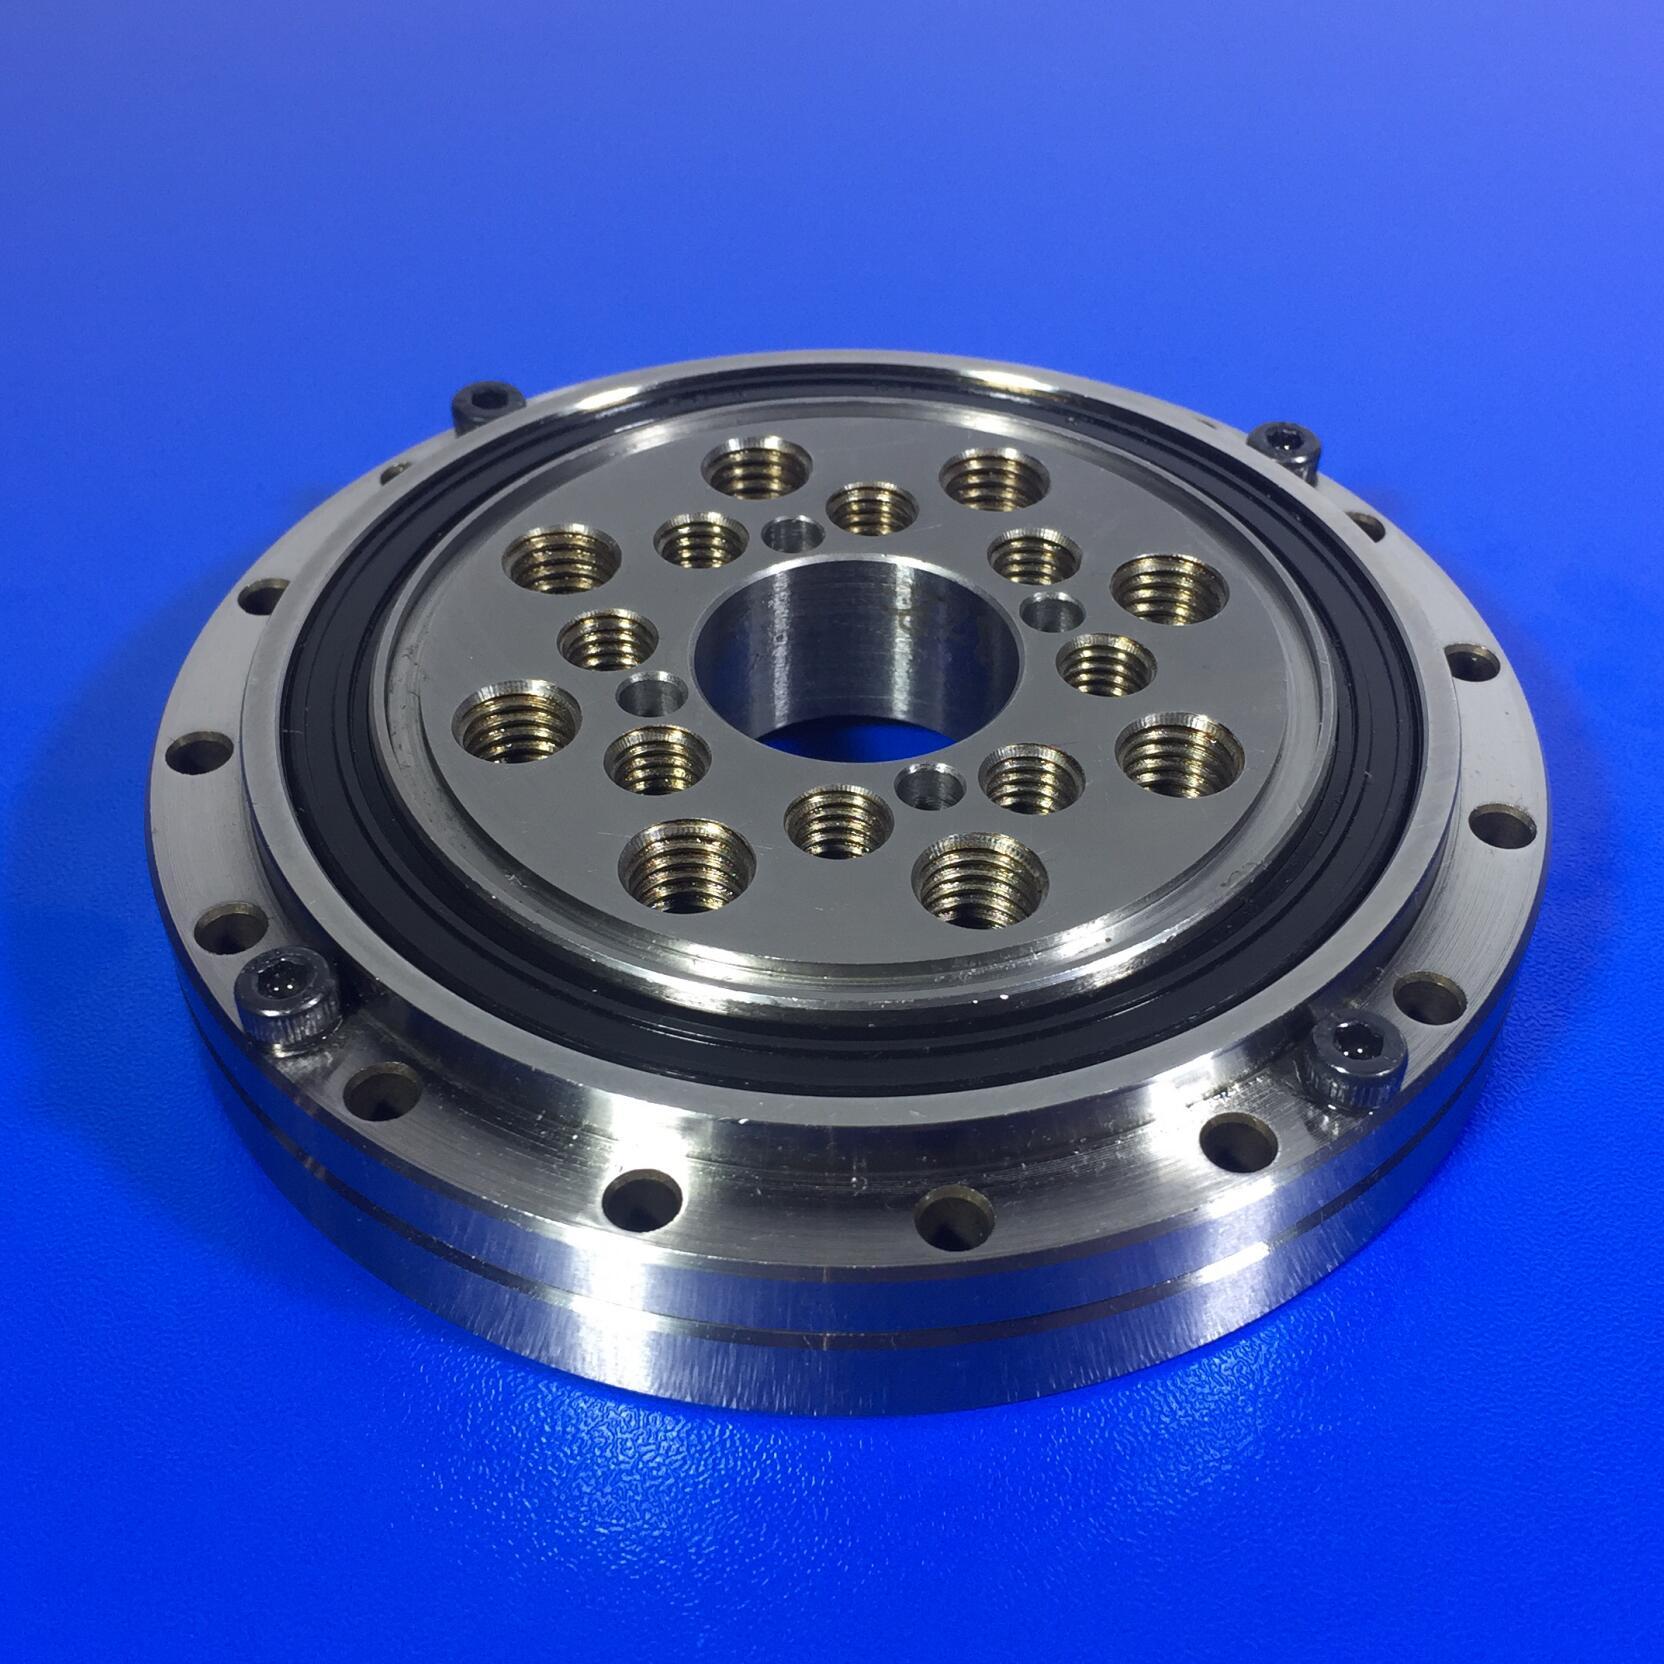 CSF-32 , CSG-32 , CRB32-112 Cross Roller Bearing For CSF/CSG Series Harmonic Drive Gear Speed Reducer-TLANMP Precison Bearings